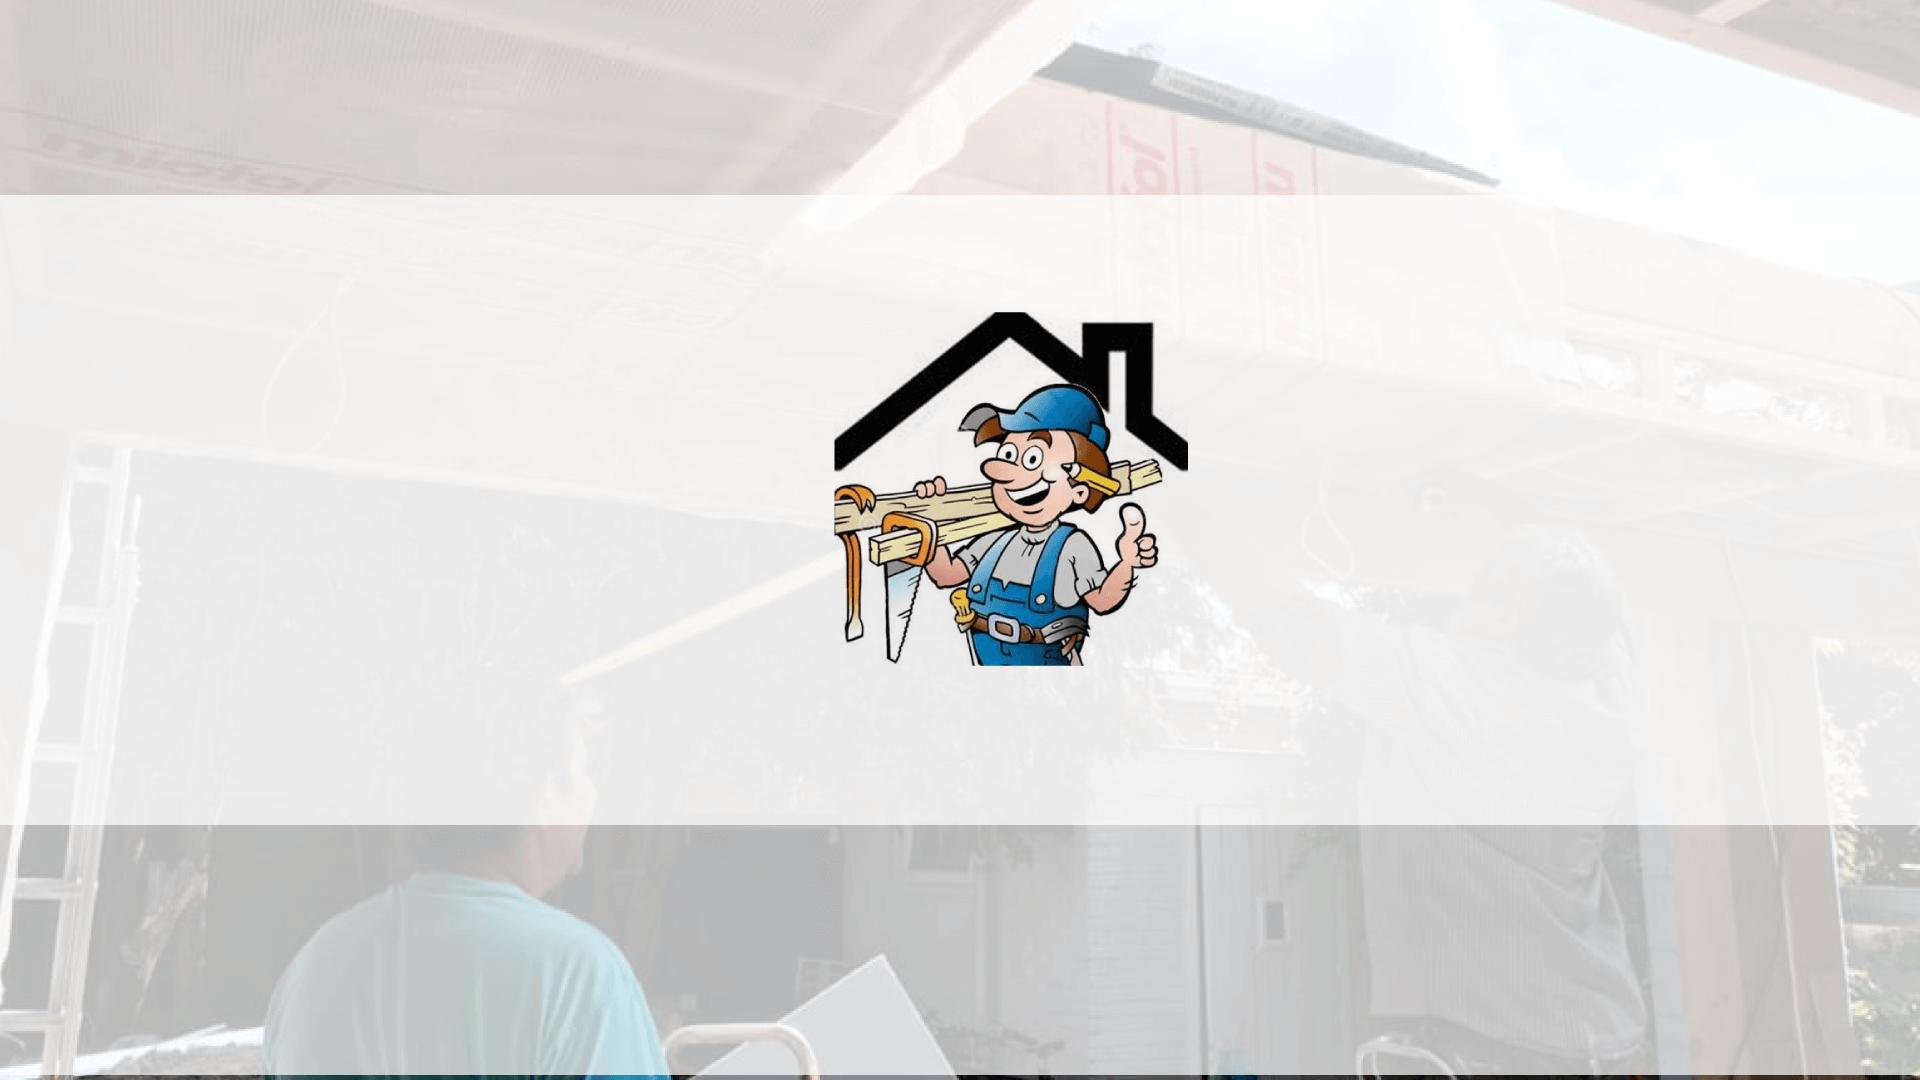 Nik's handyman services